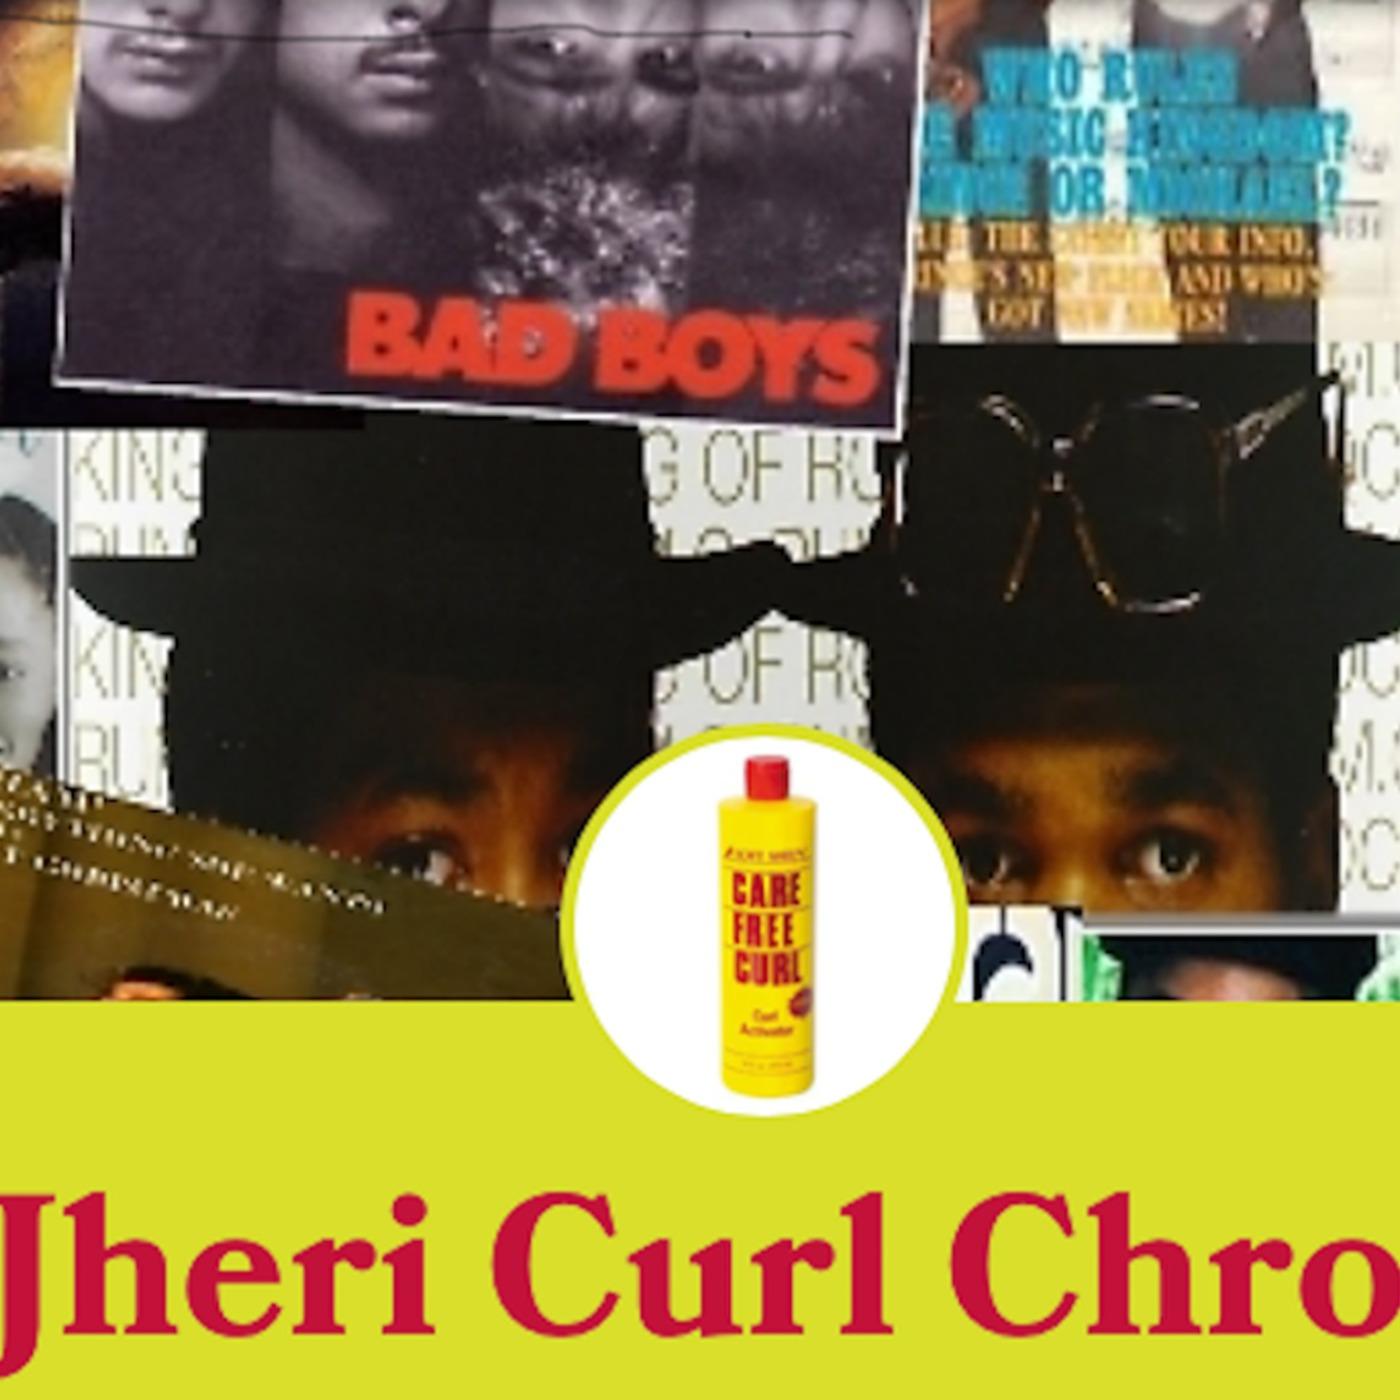 The Jheri Curl Chronicles 140: Shooting Your Shot The Jheri Curl